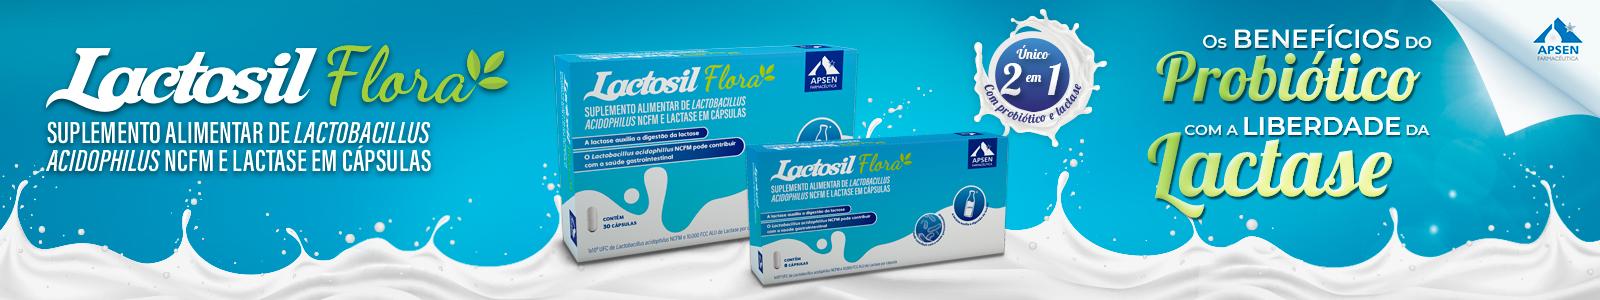 Banner-LactosilFlora-1600x300